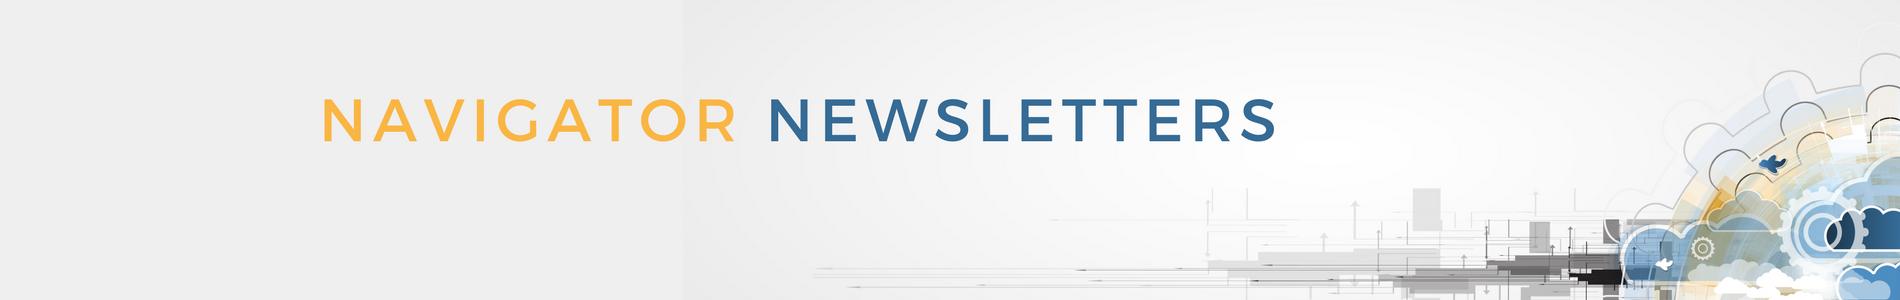 Navigator newsletters